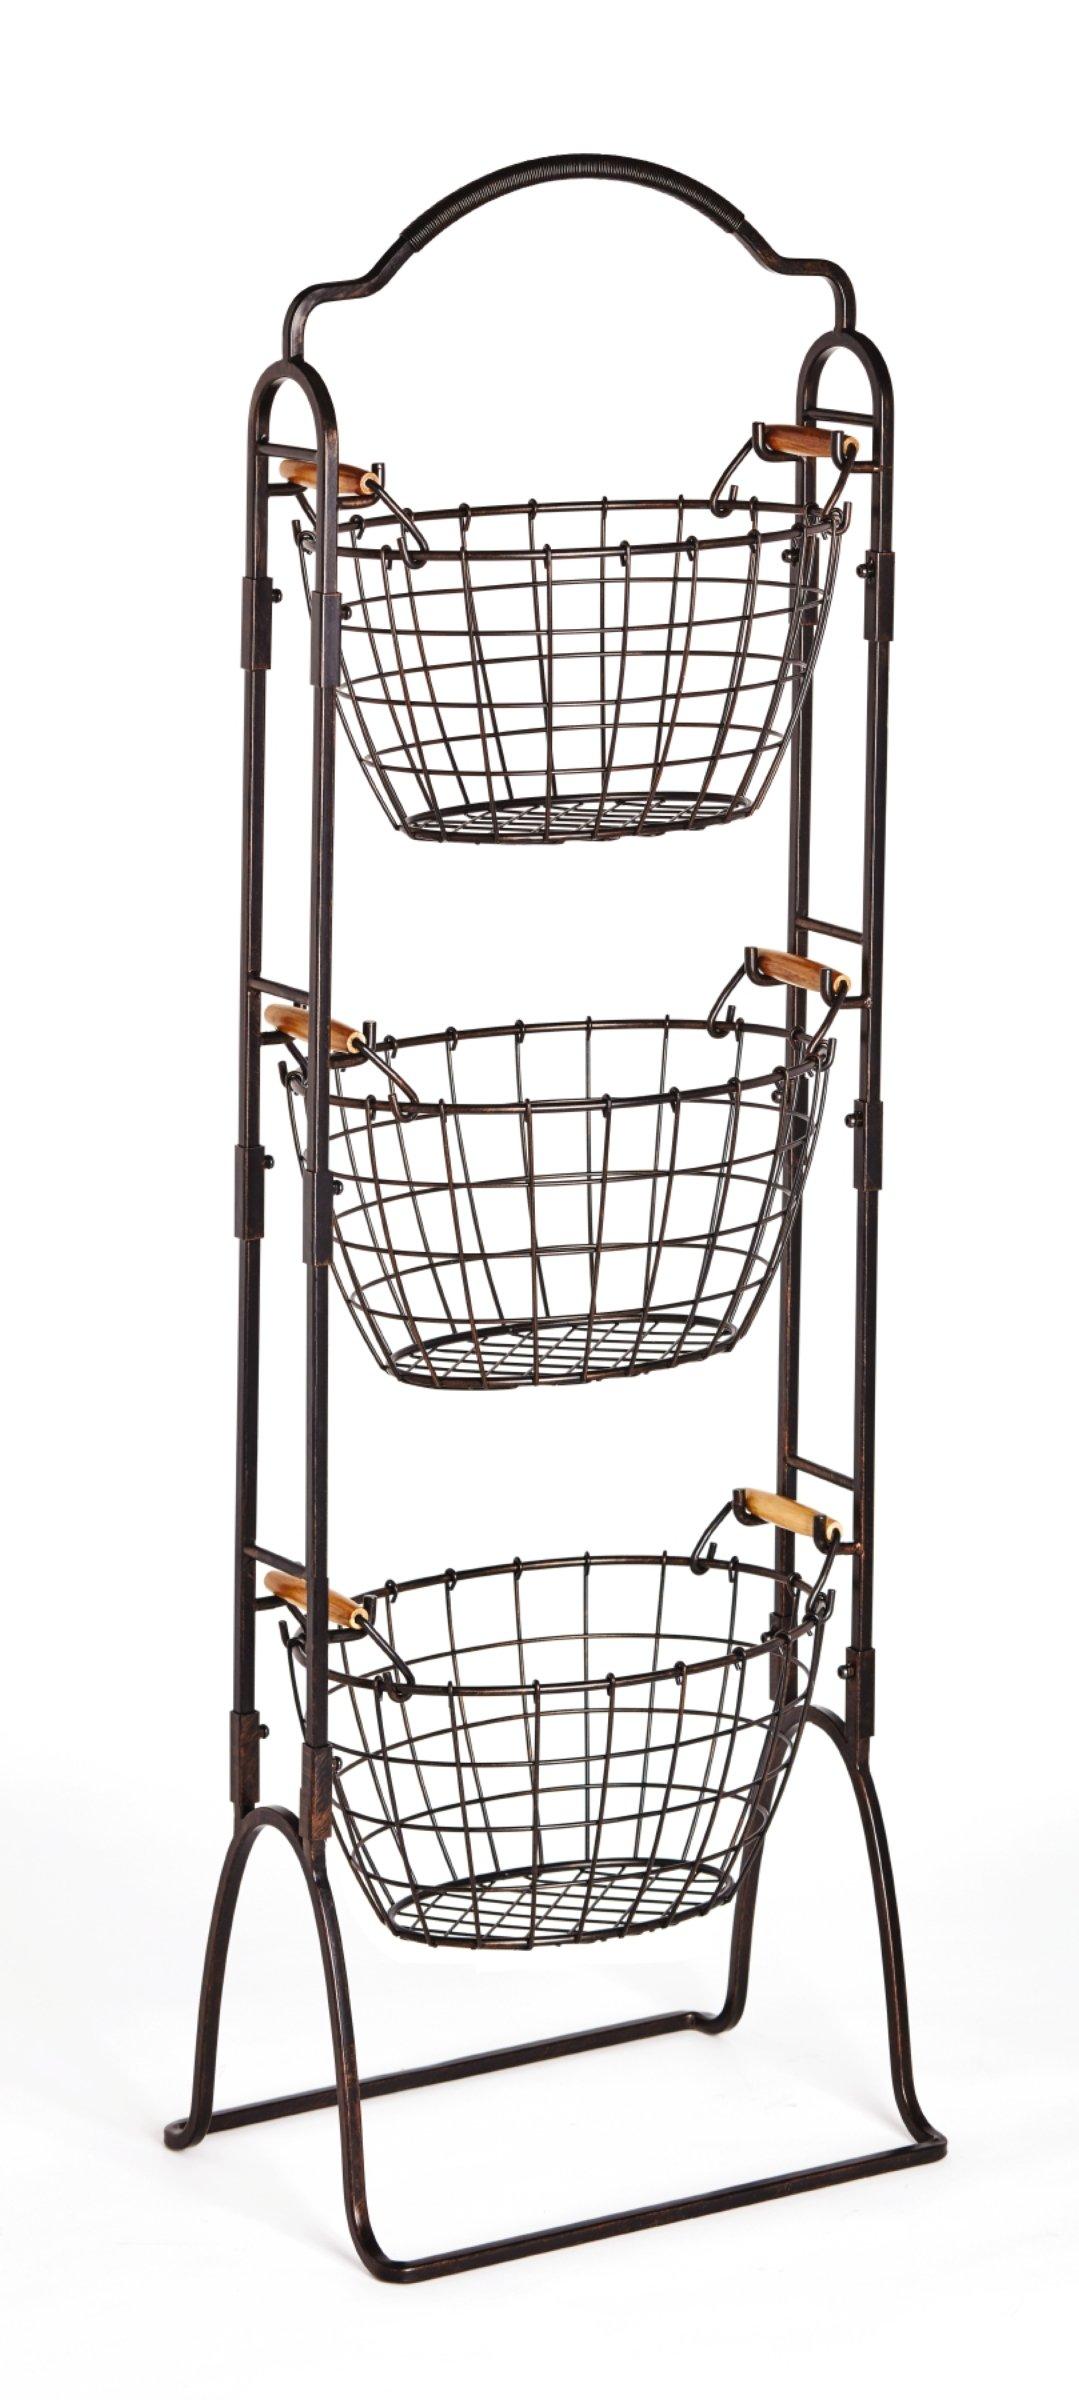 Gourmet Basics by Mikasa 5184916 Harbor Adjustable 3-Tier Metal Floor Standing Fruit/Home Storage Basket, Antique Black